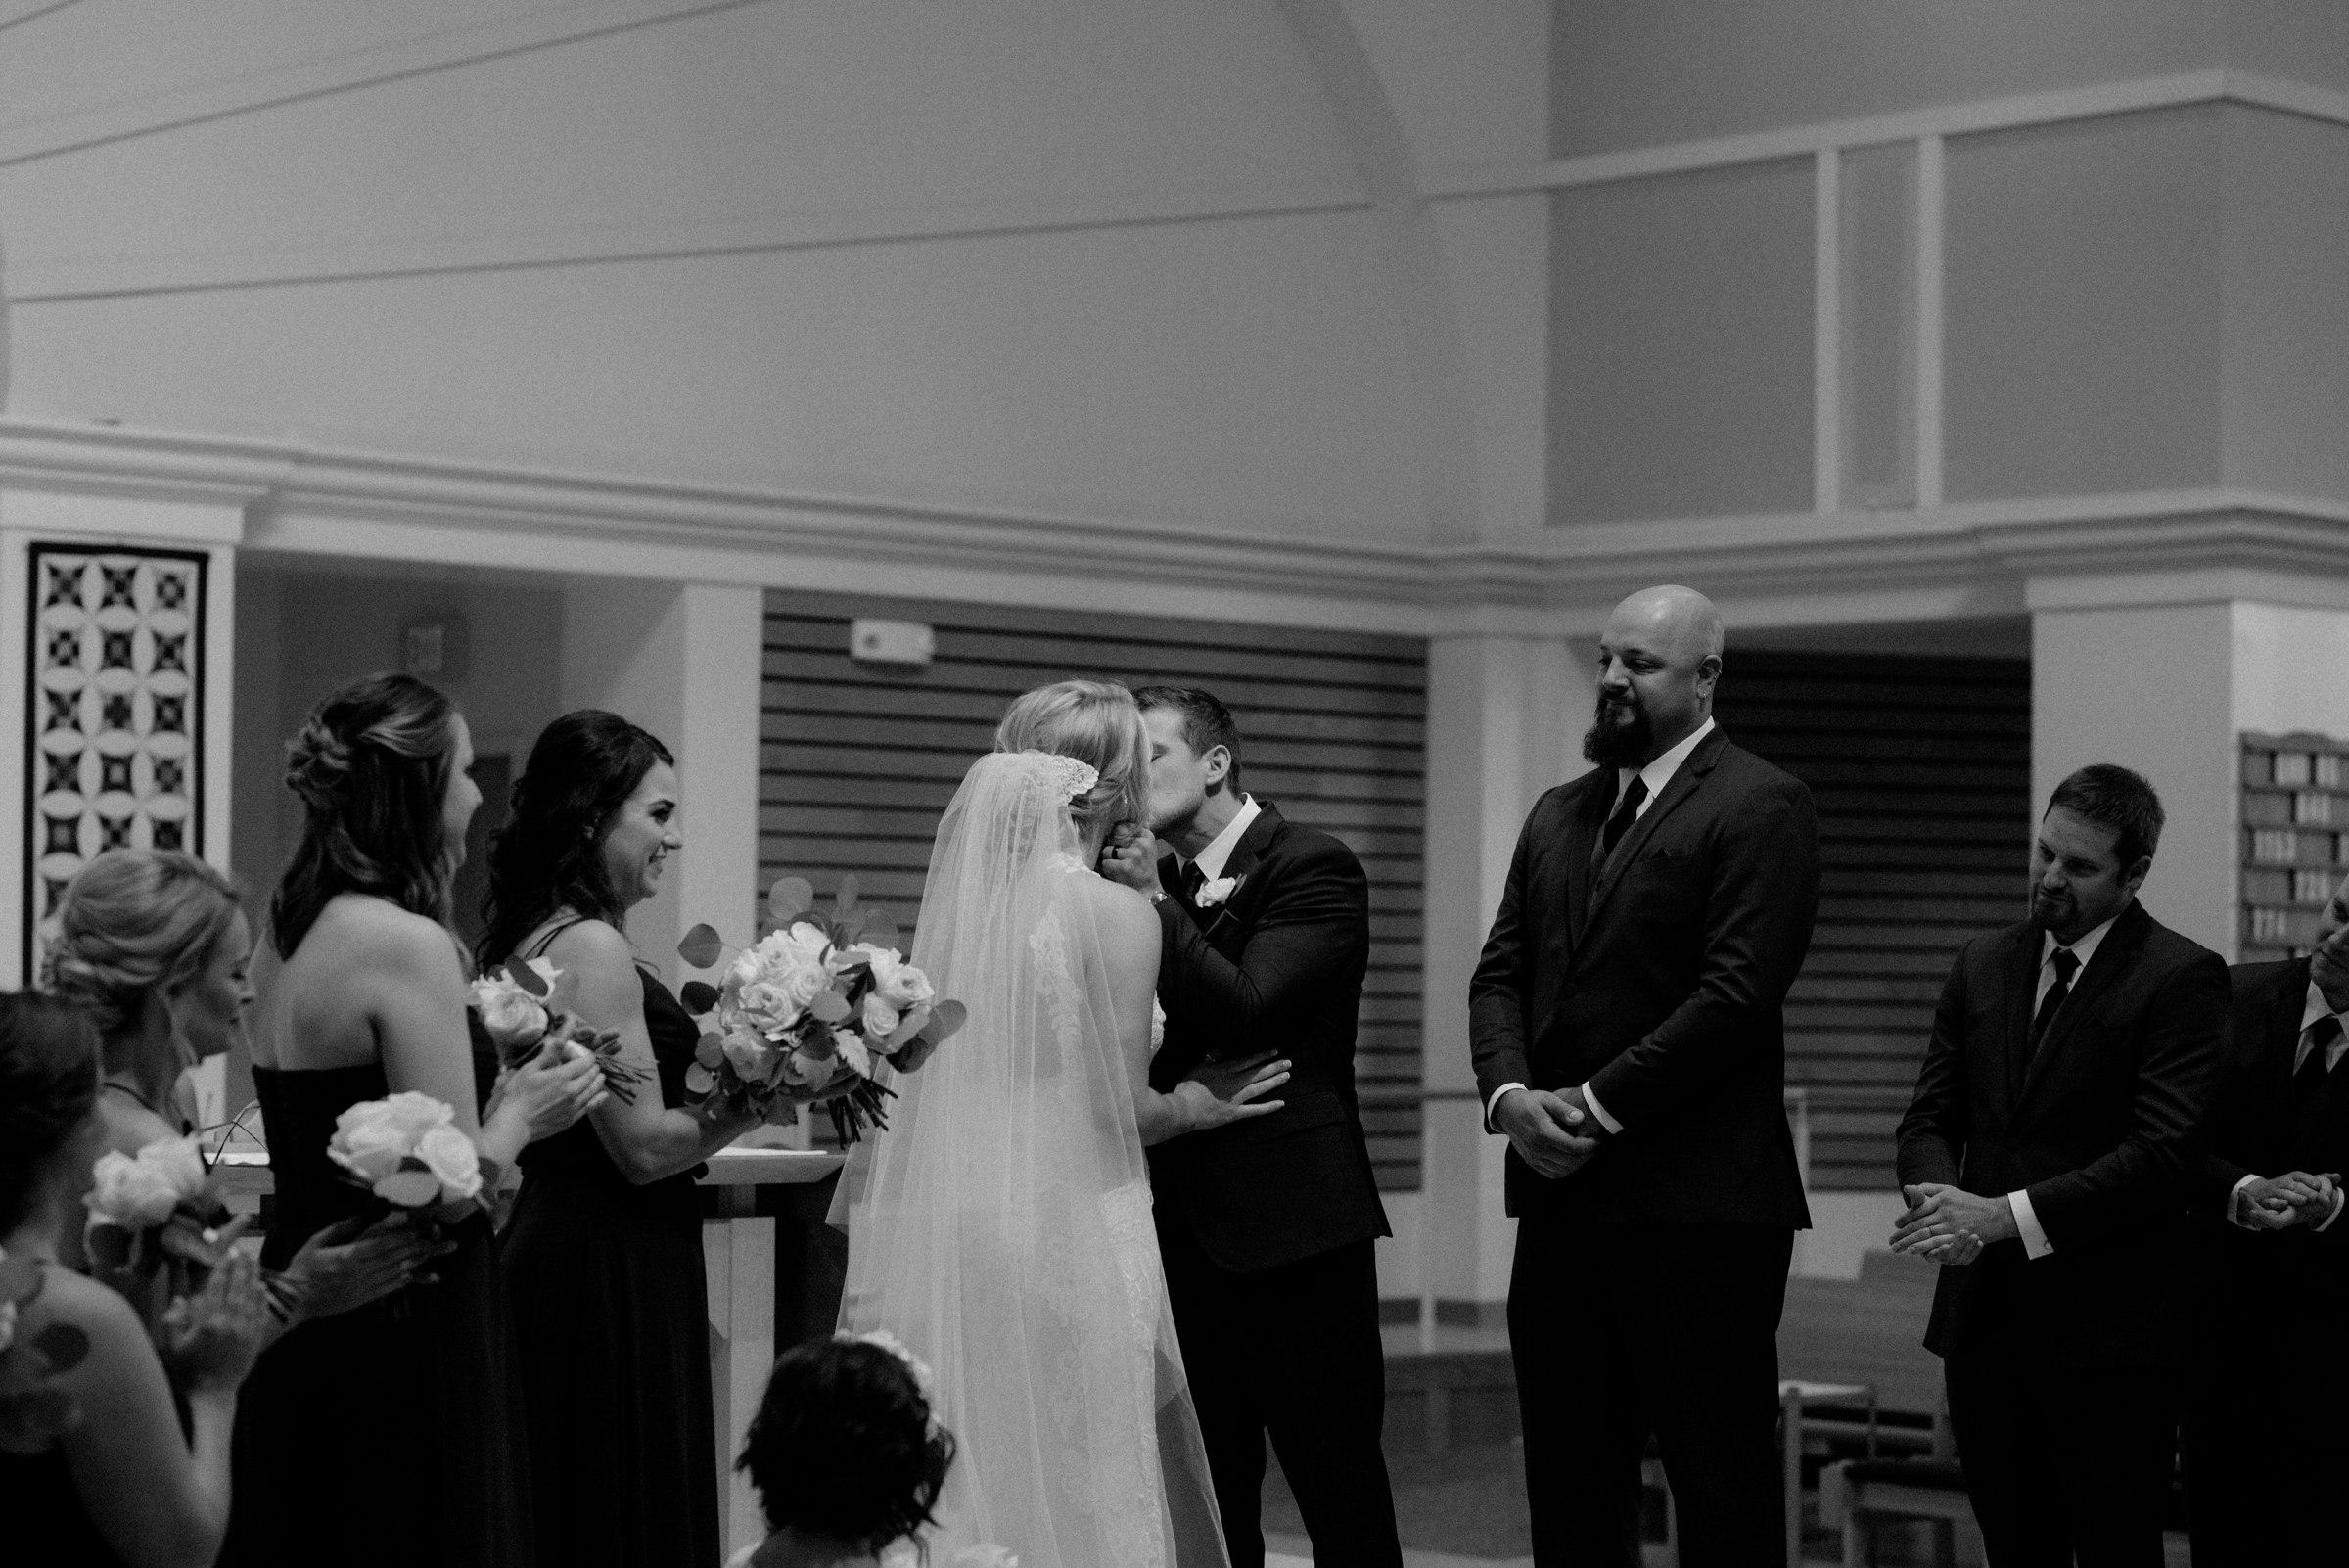 elopement-photographer-austin-best-wedding-minneapolis-adventurous-wedding-modern-morocco-new york-new orleans-mexica-costa rica-italy-affordable-best_0053.jpg